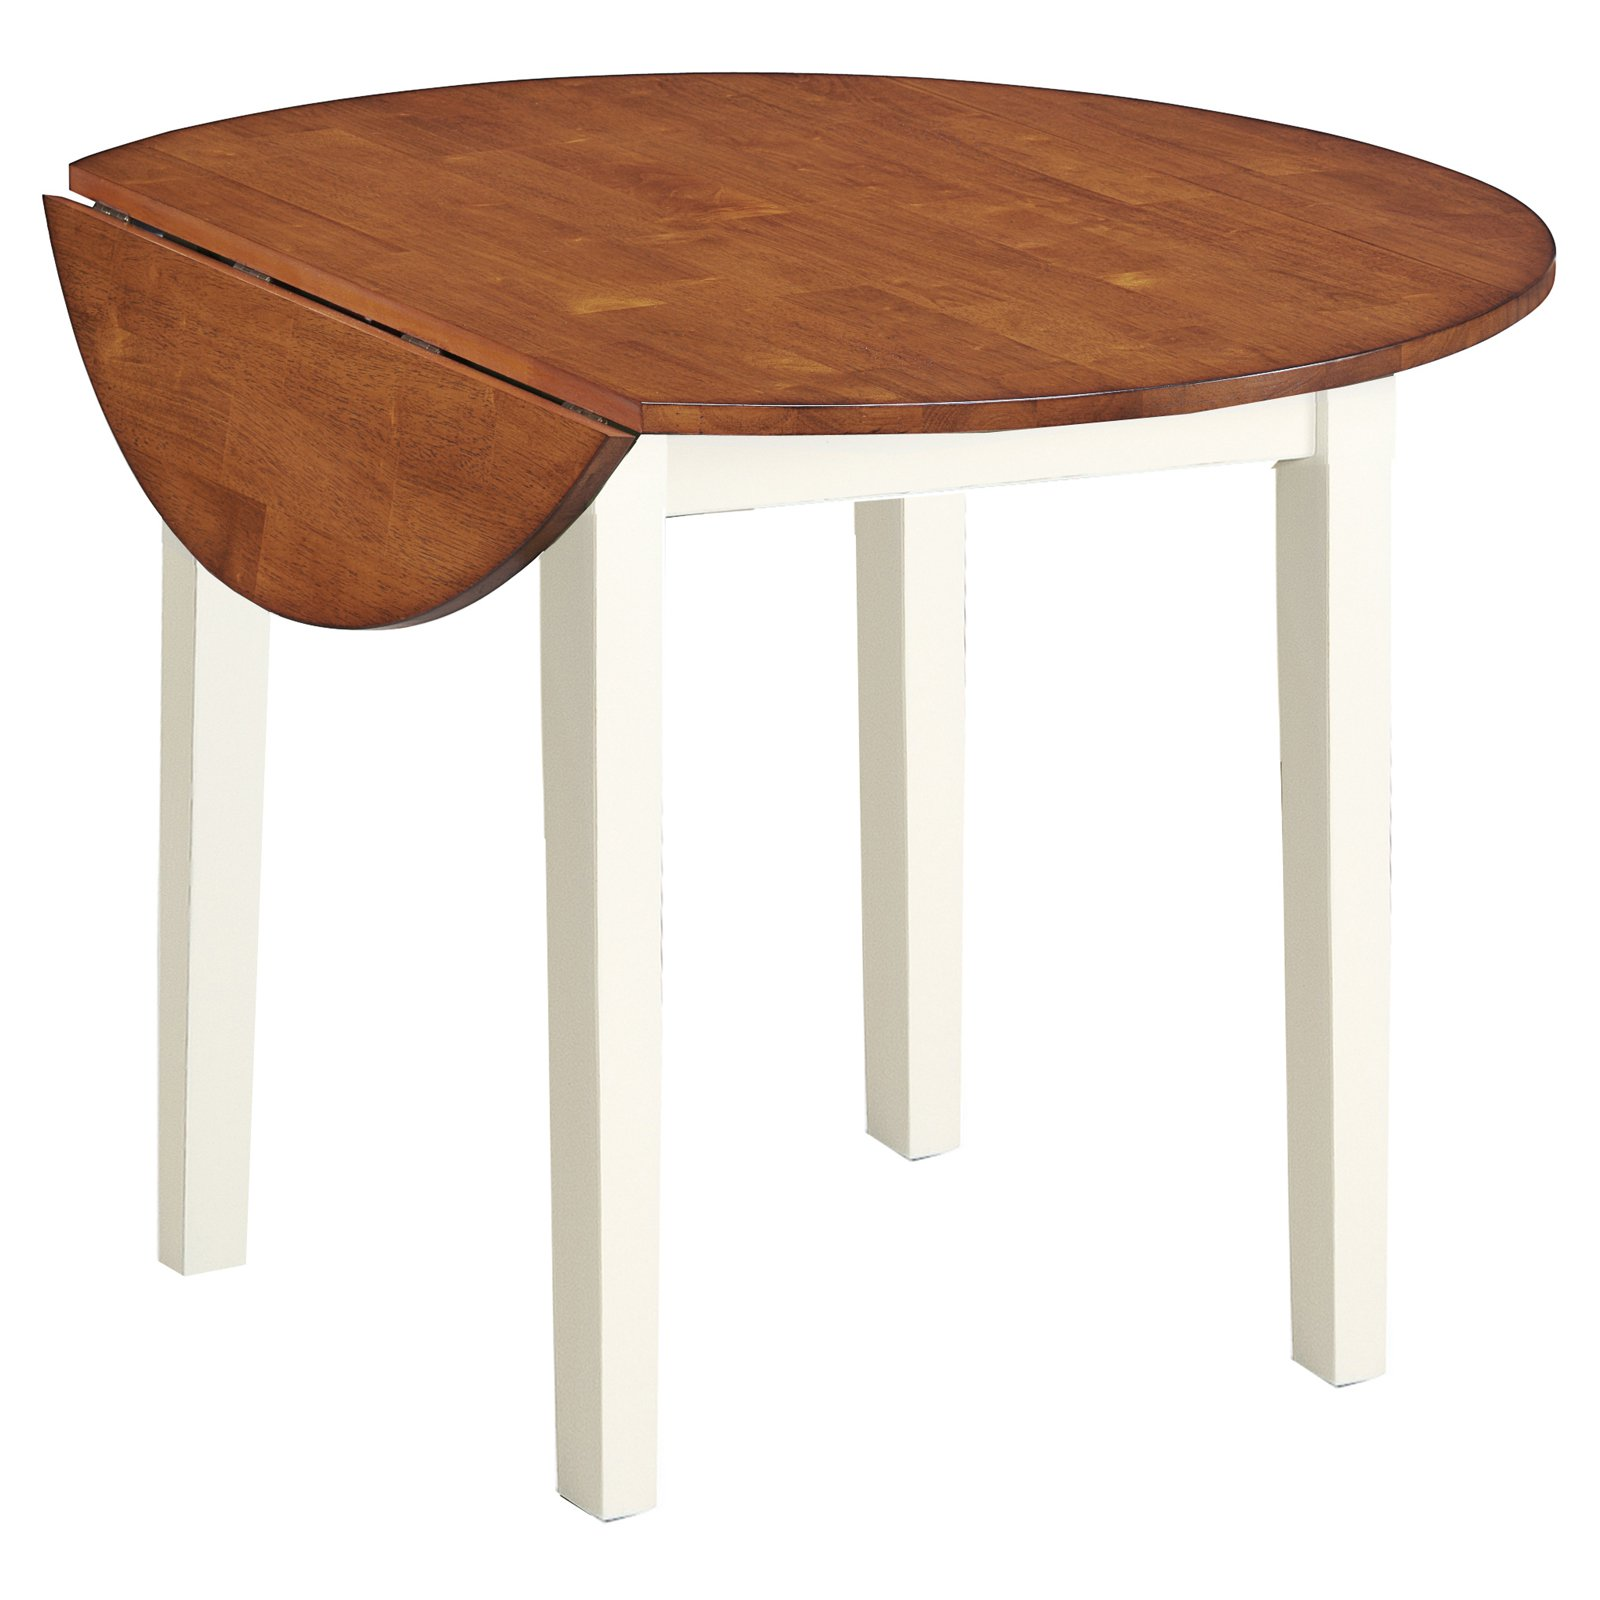 Imagio Home Drop Leaf Arlington Dining Table, White and Java